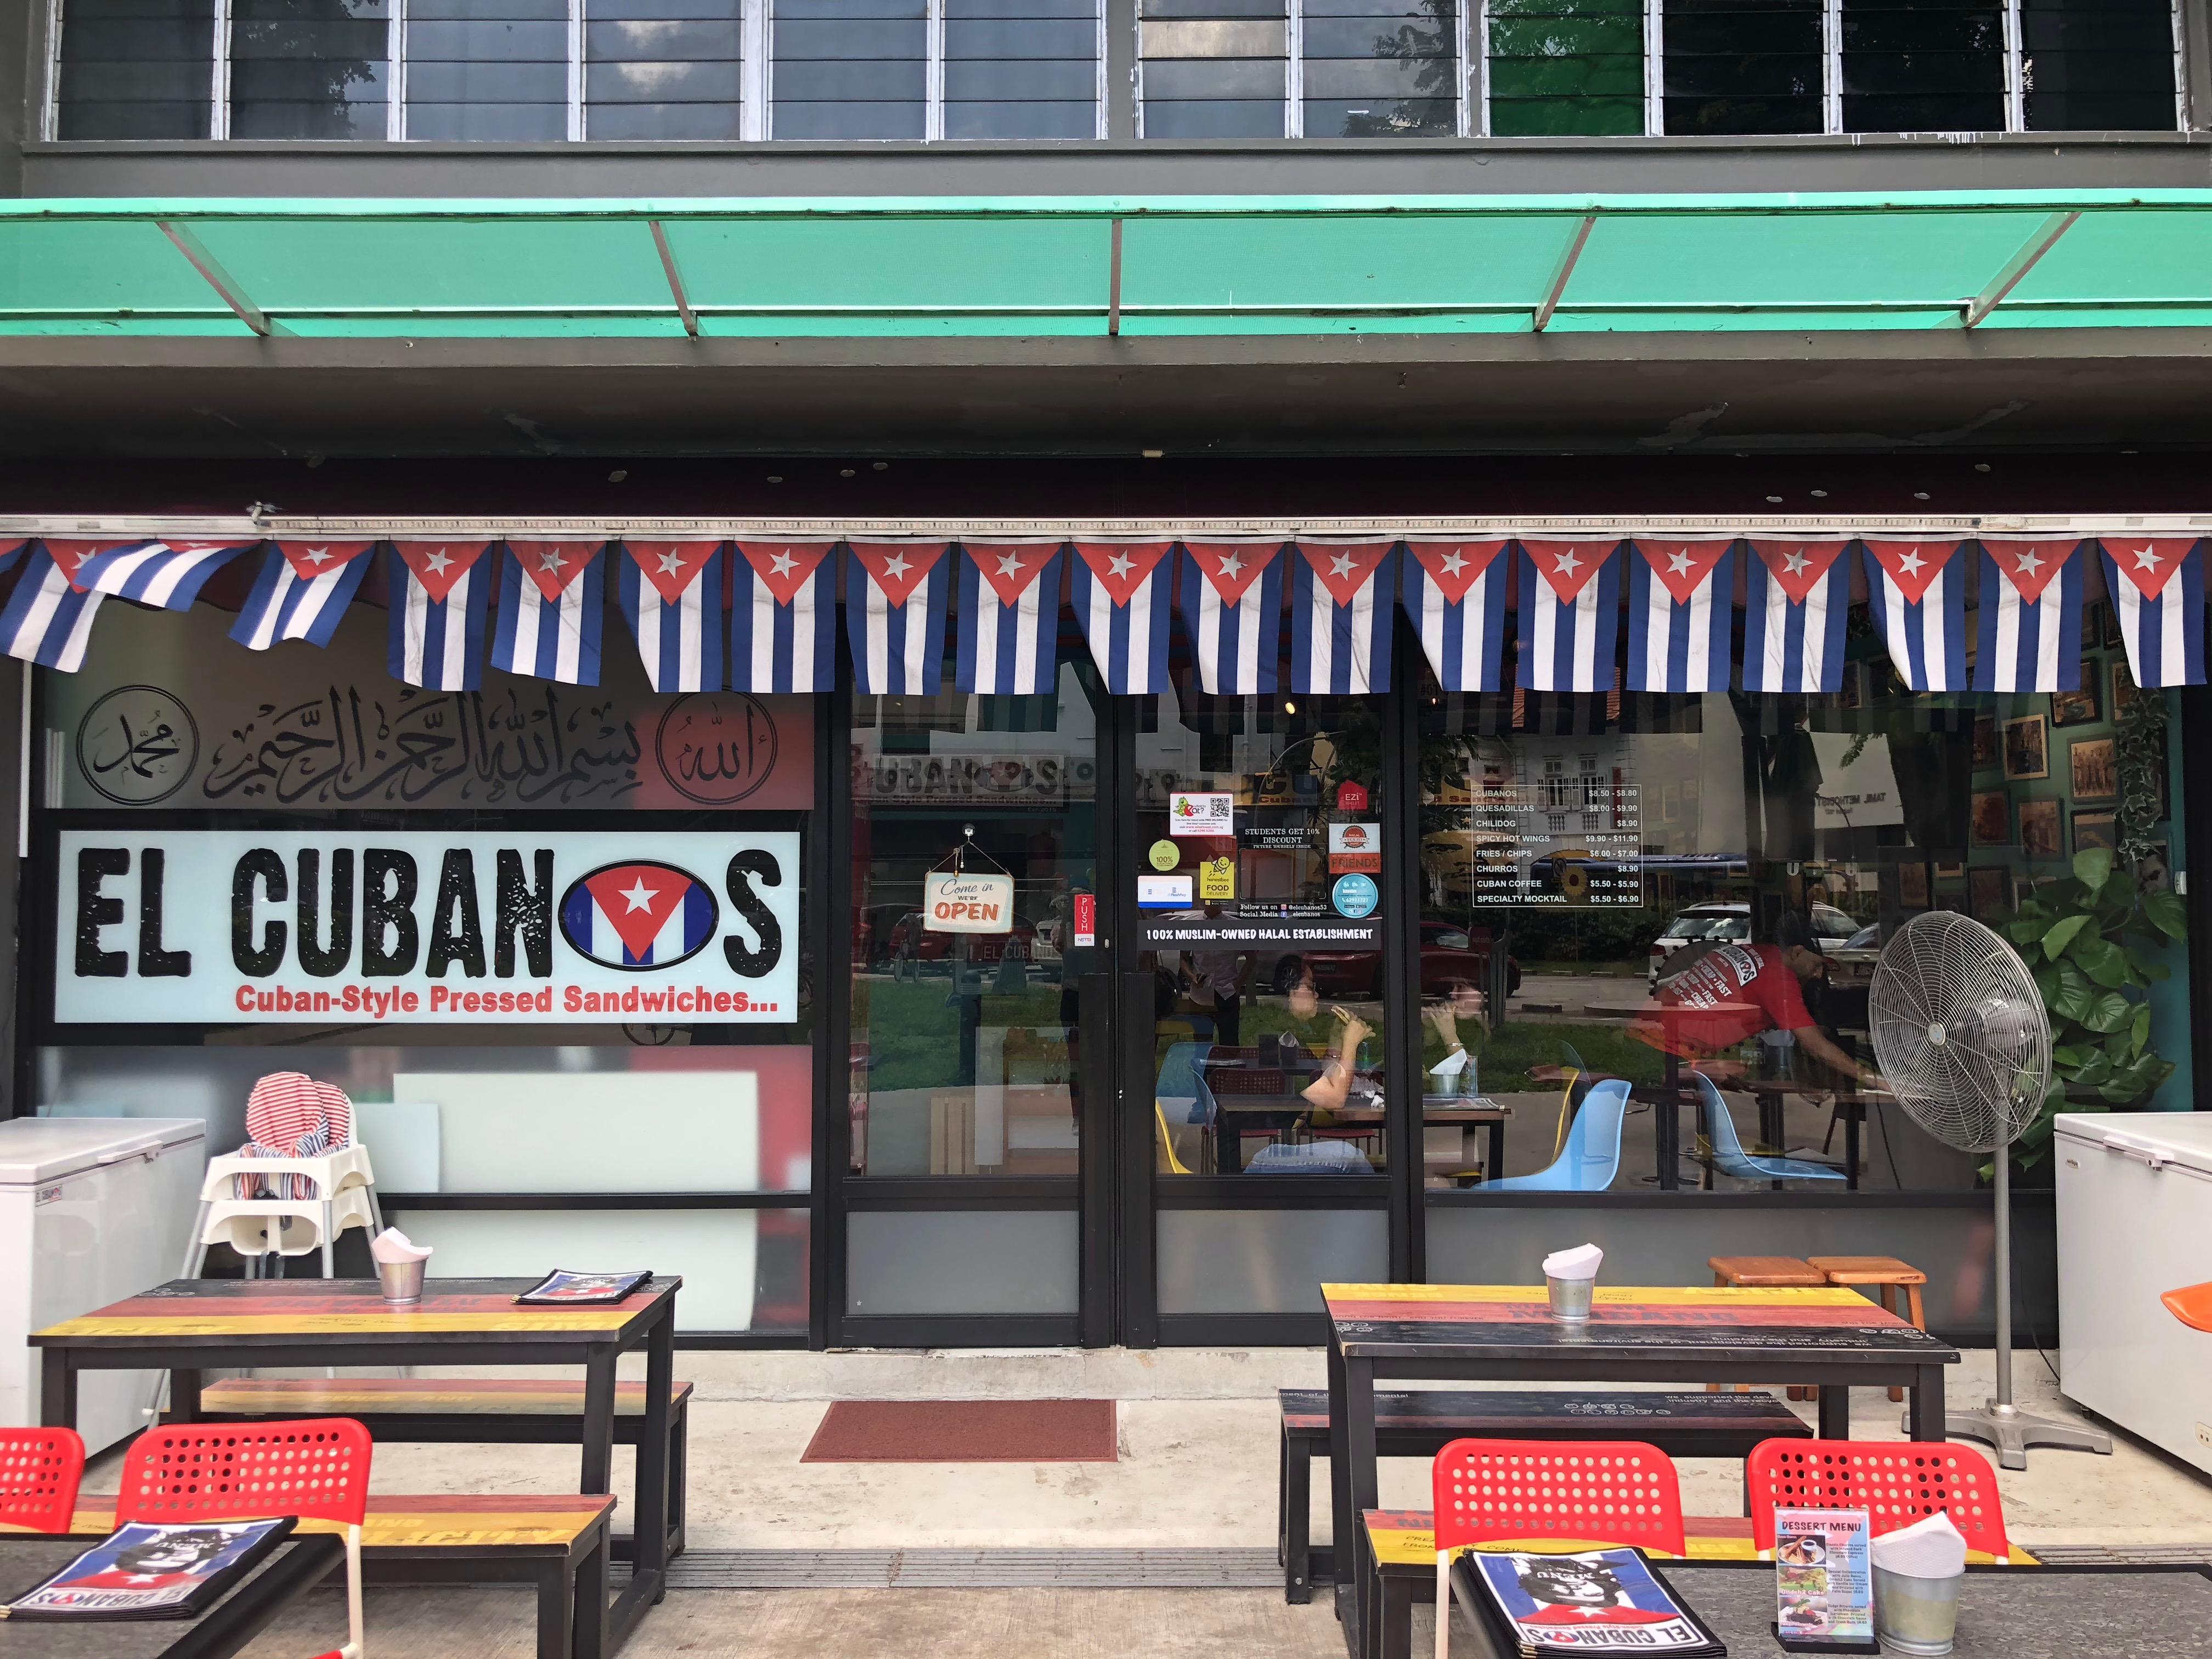 El_Cubanos_StorefrontJPG